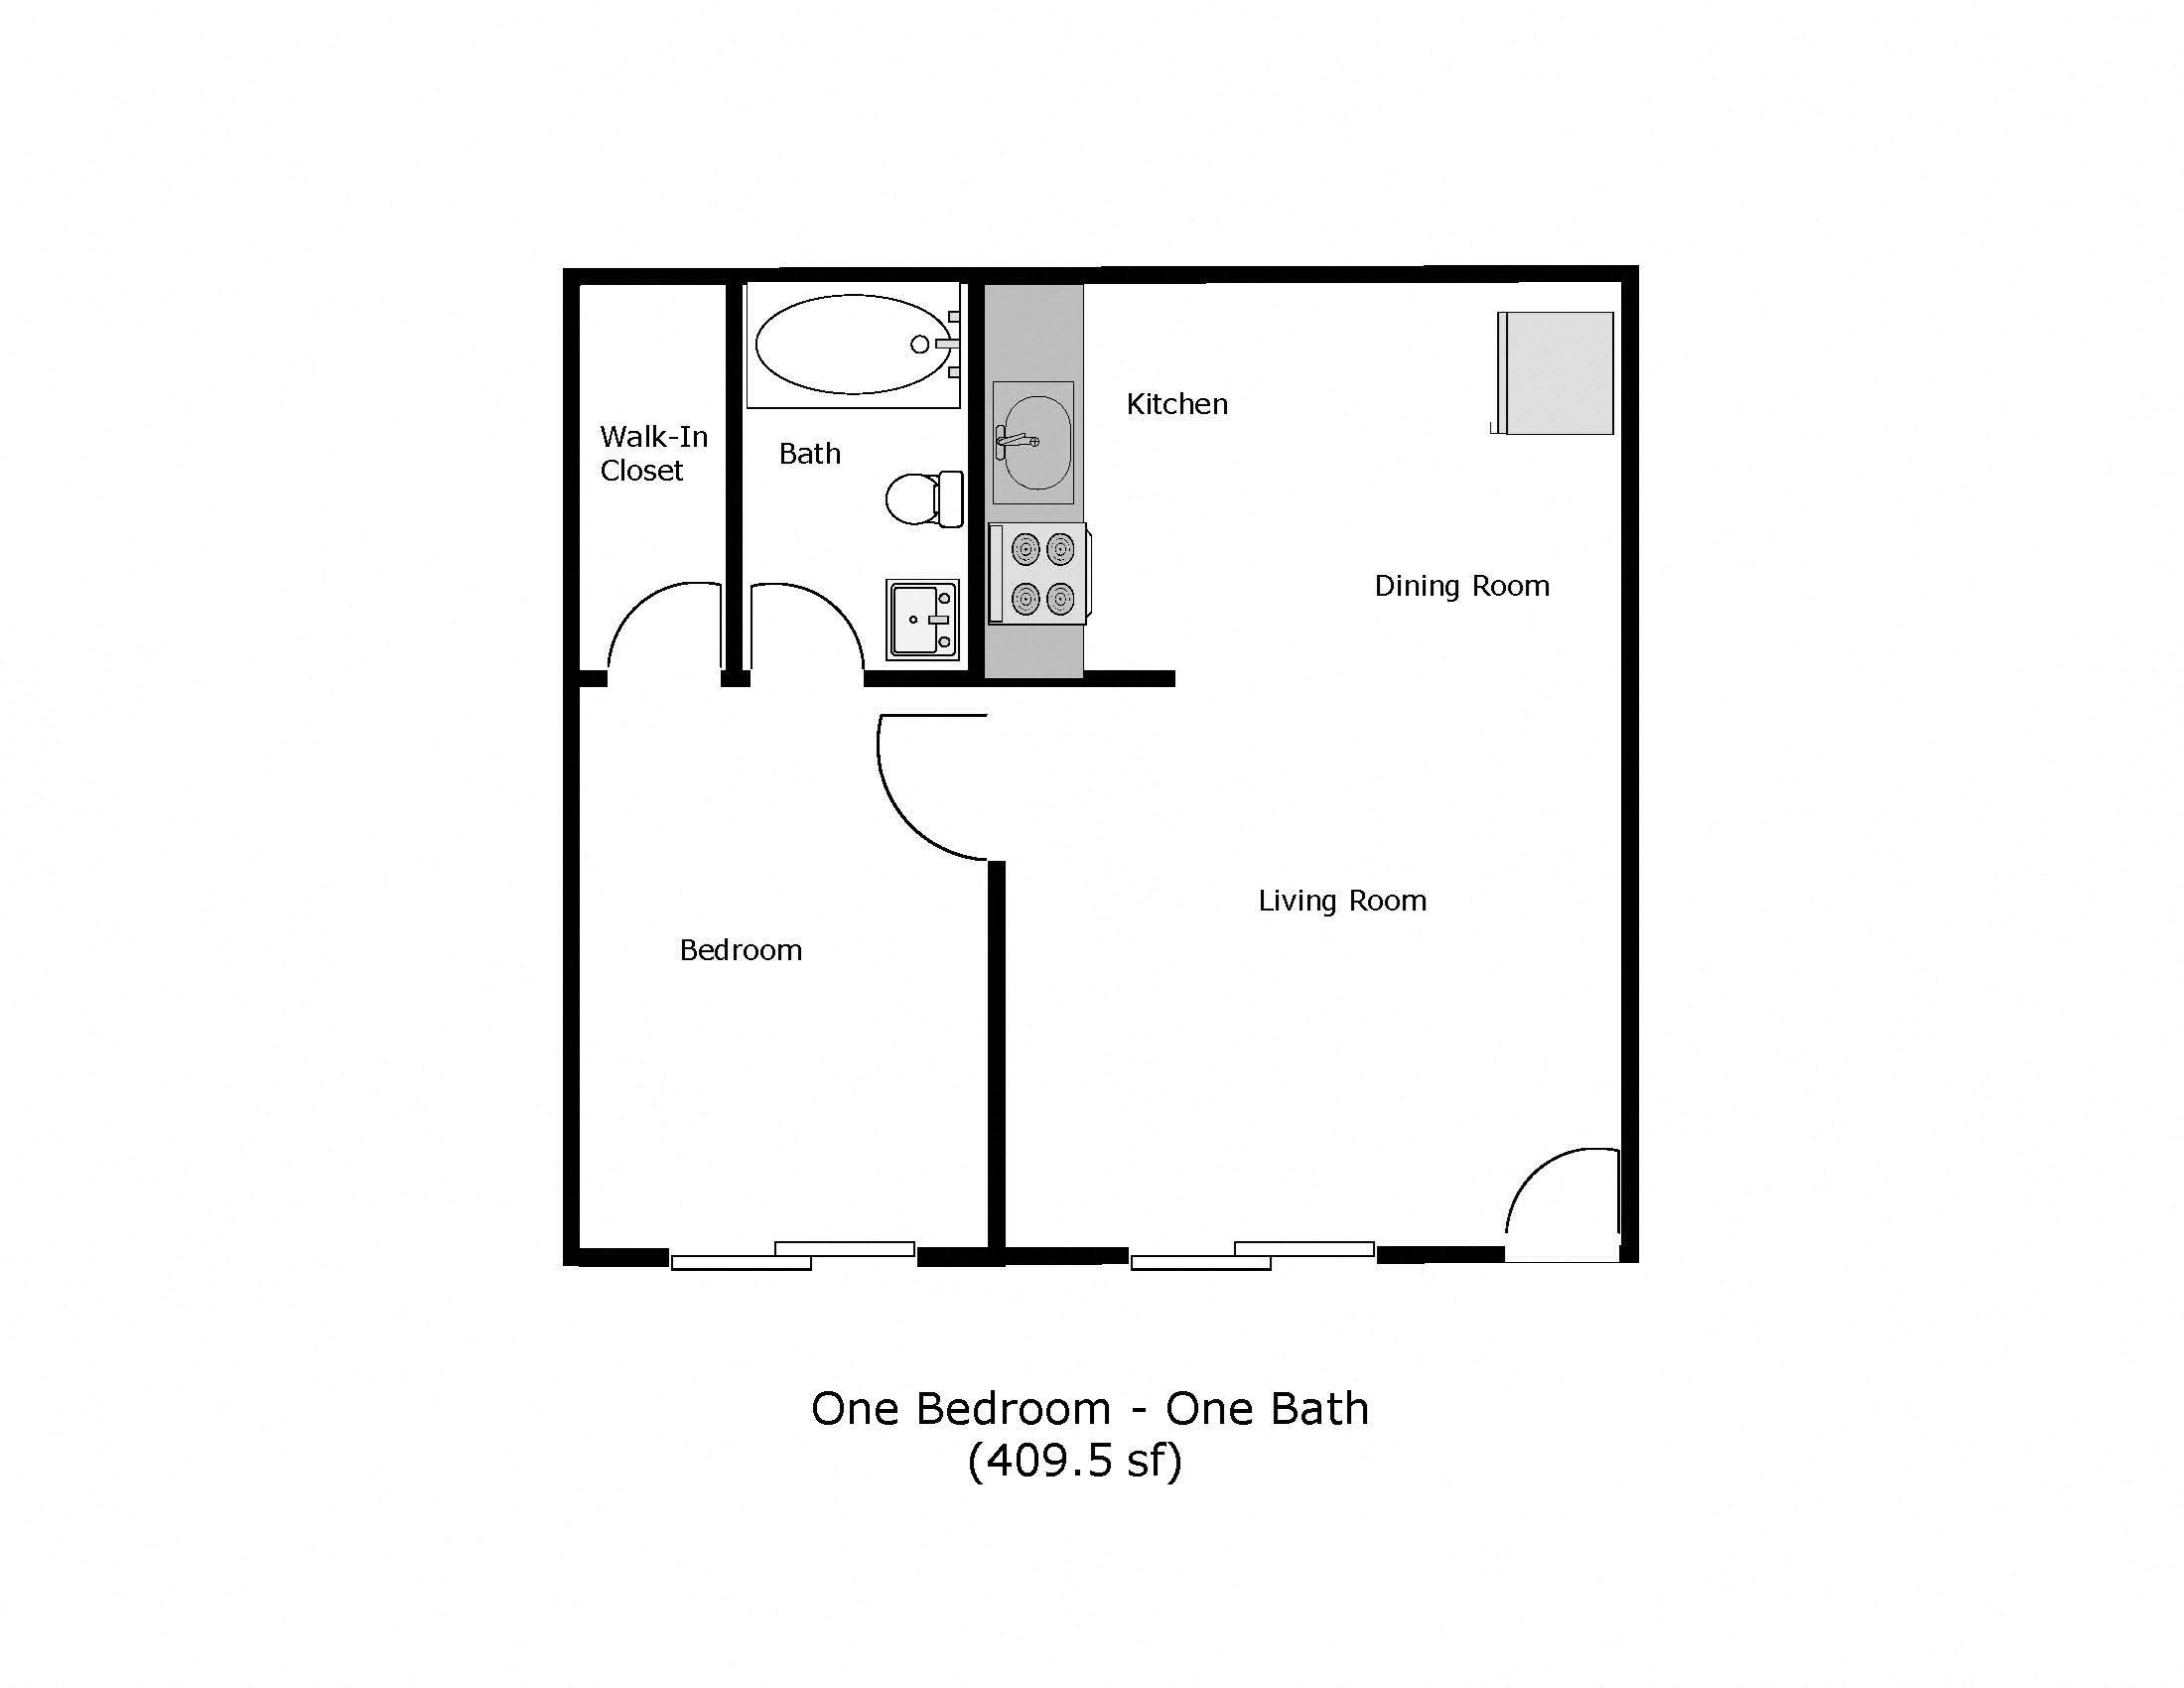 Tradewinds - 1189 Dana Drive, Fairfield - 1 Bed 1 Bath Floor Plan 6